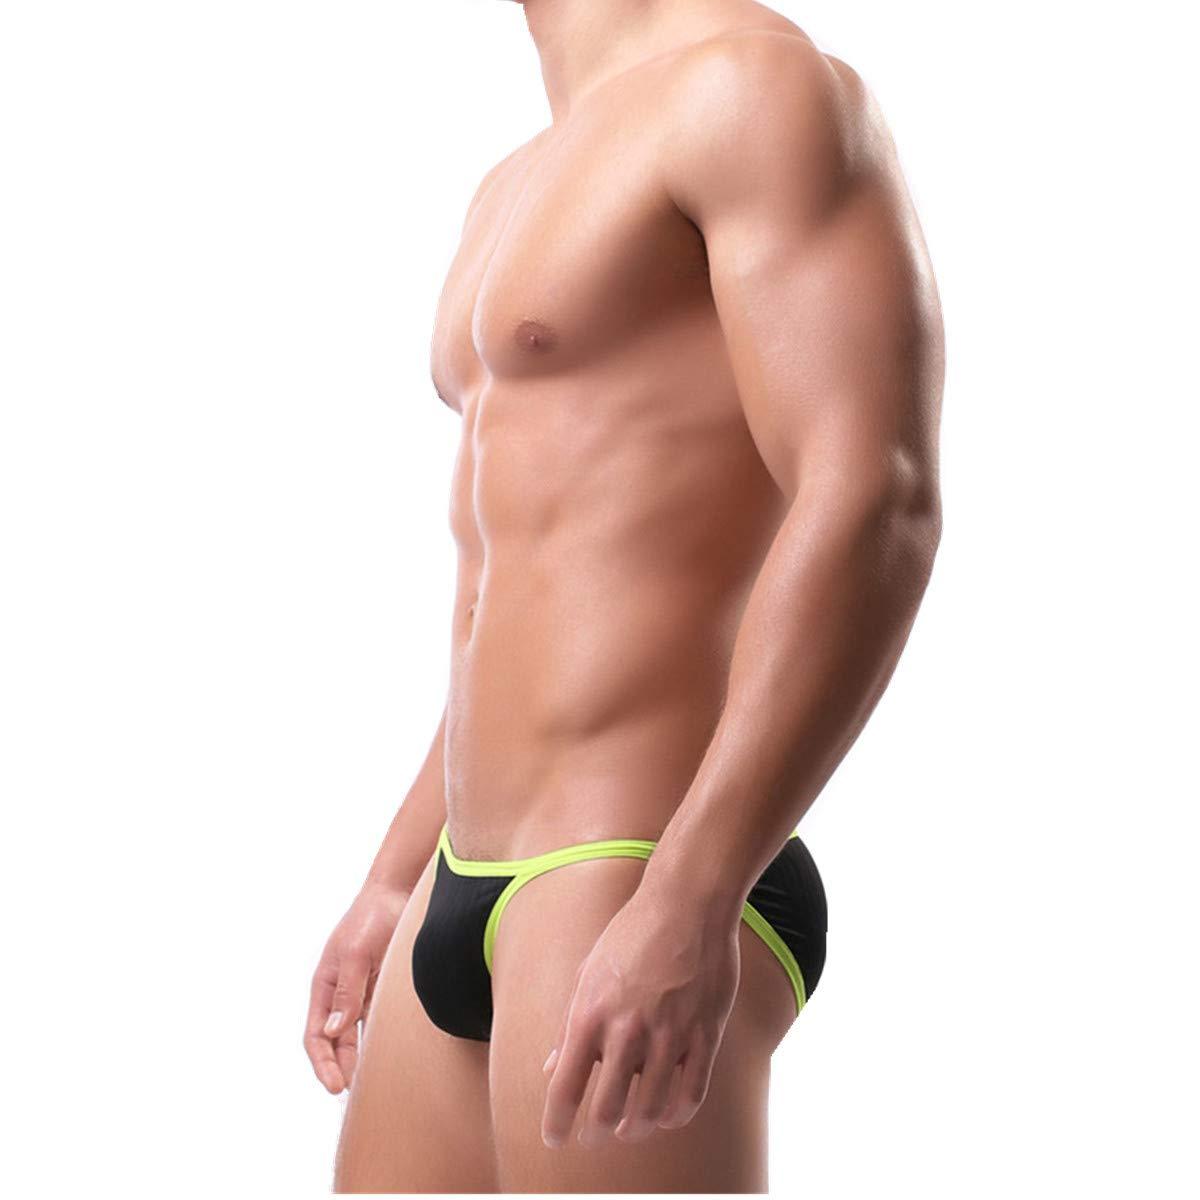 YOOBNG Mens High-Leg Opening Comfortable Bulge Bikini Underwear Breathable Low Rise Strings Briefs